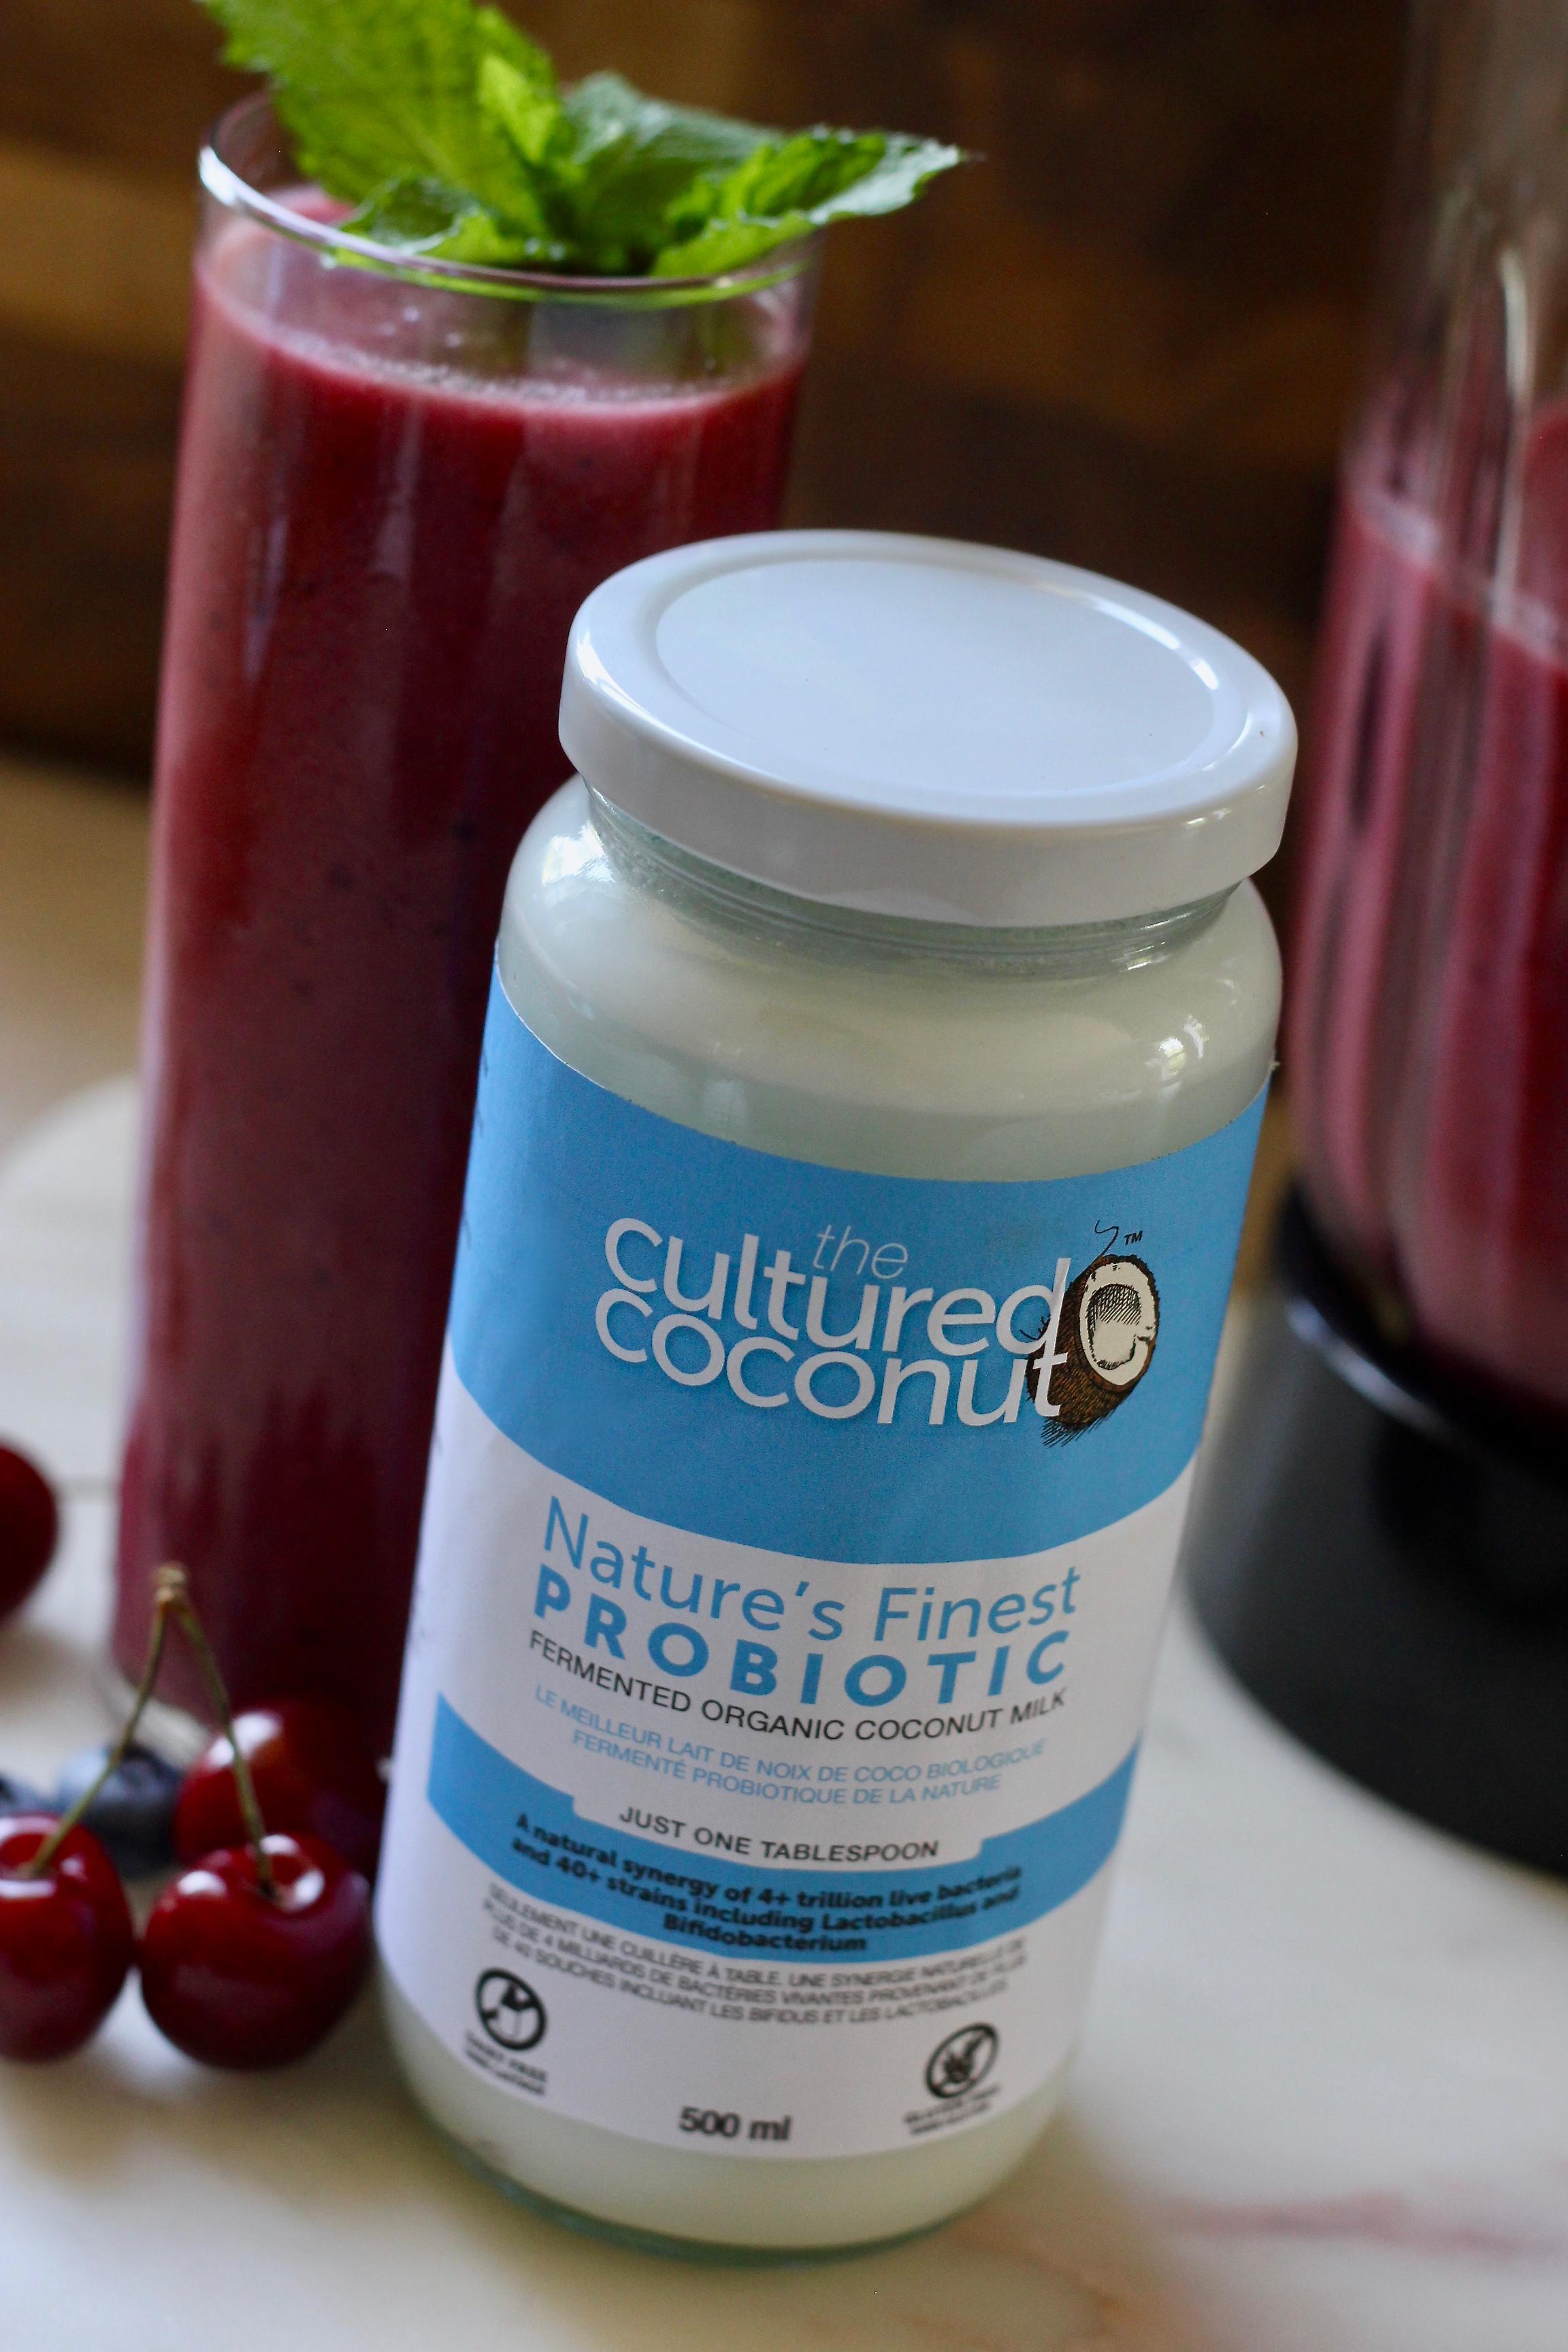 The Cultured Coconut Probiotic